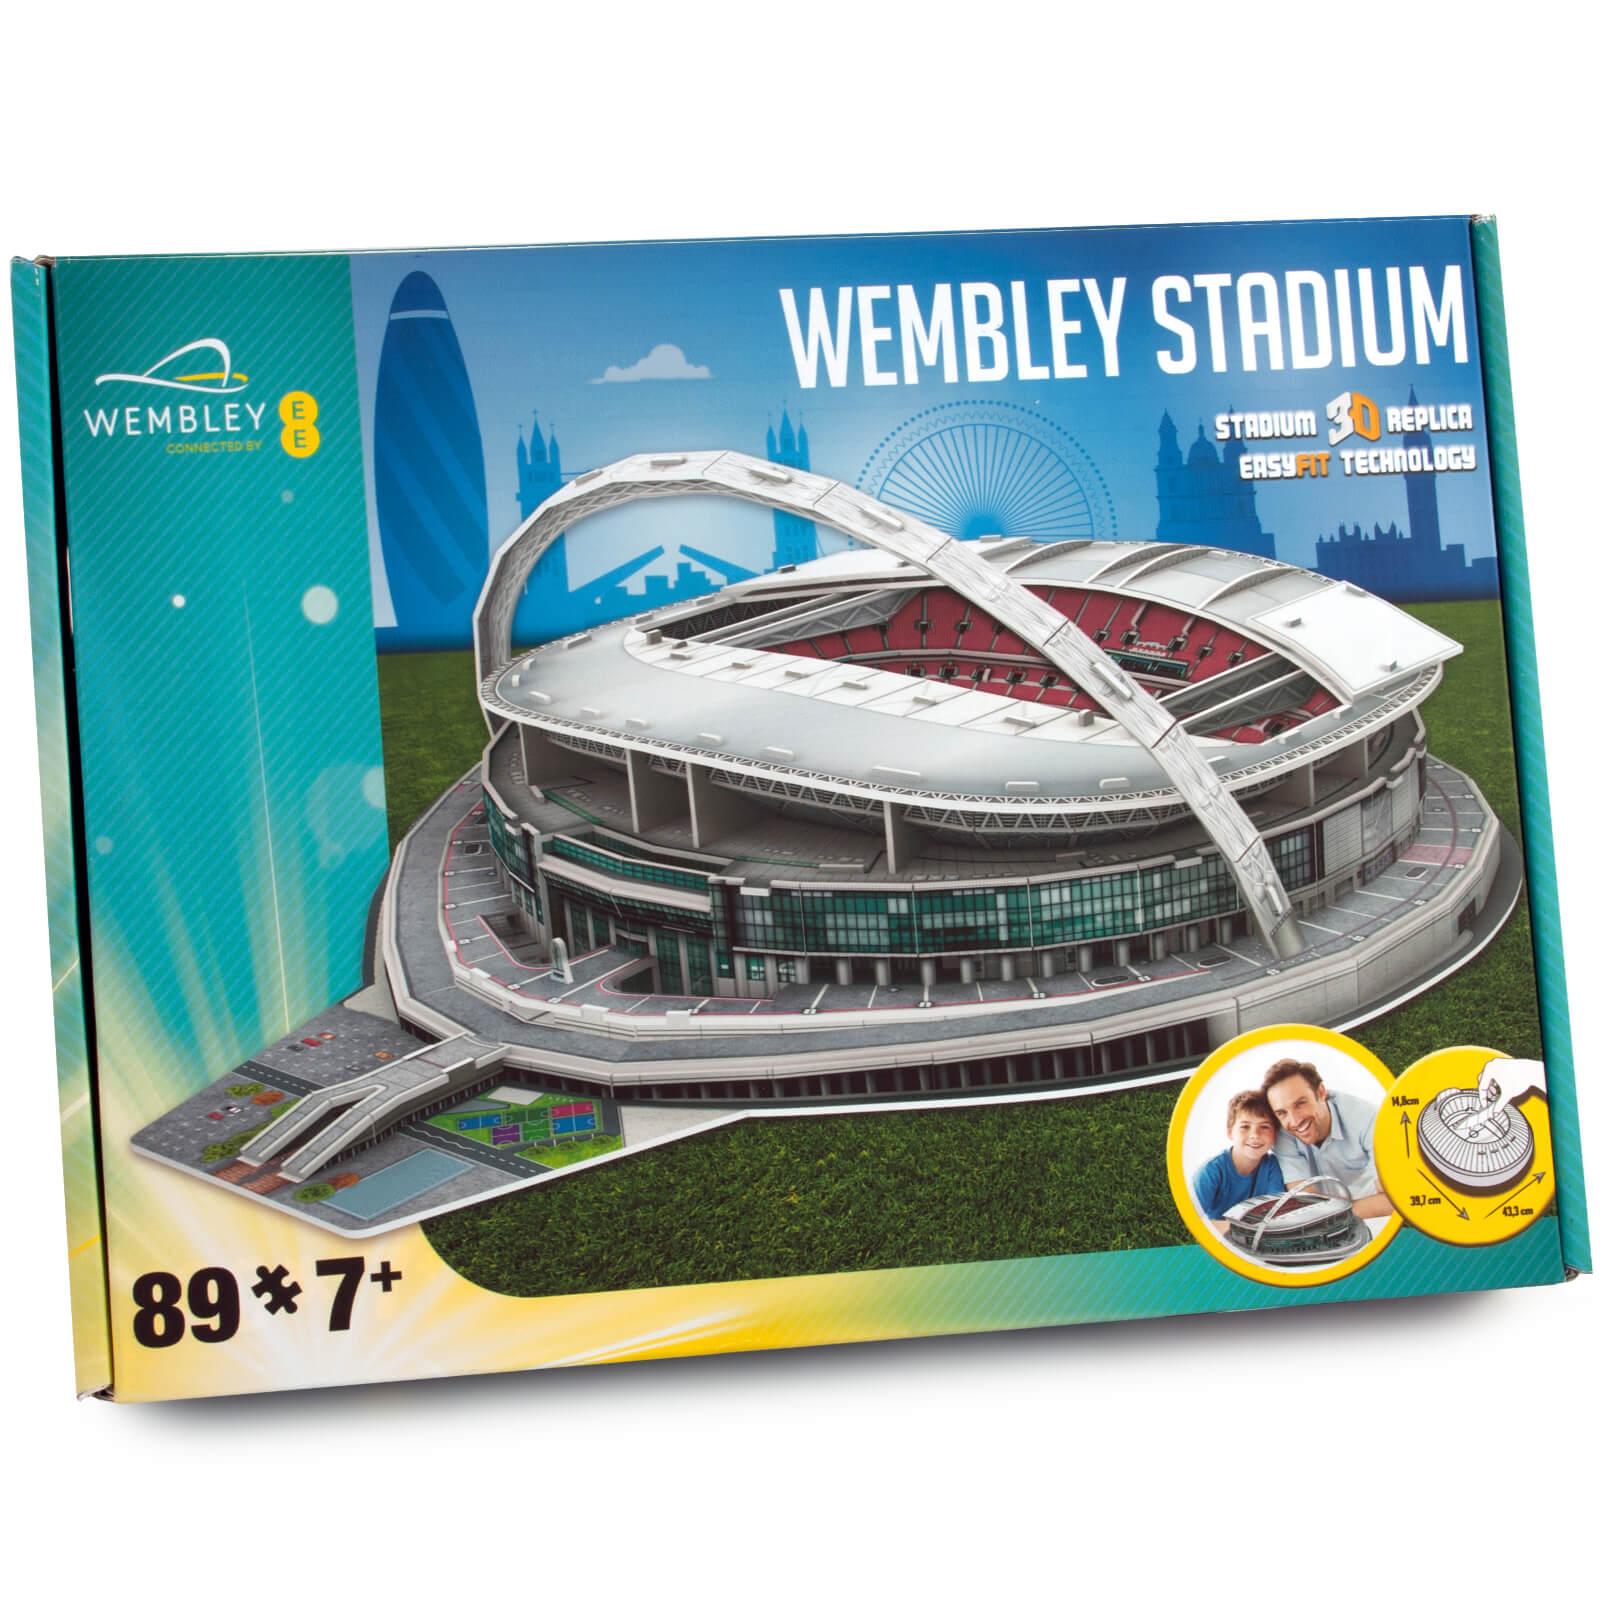 Image of 3D Puzzle Football Stadium - Wembley